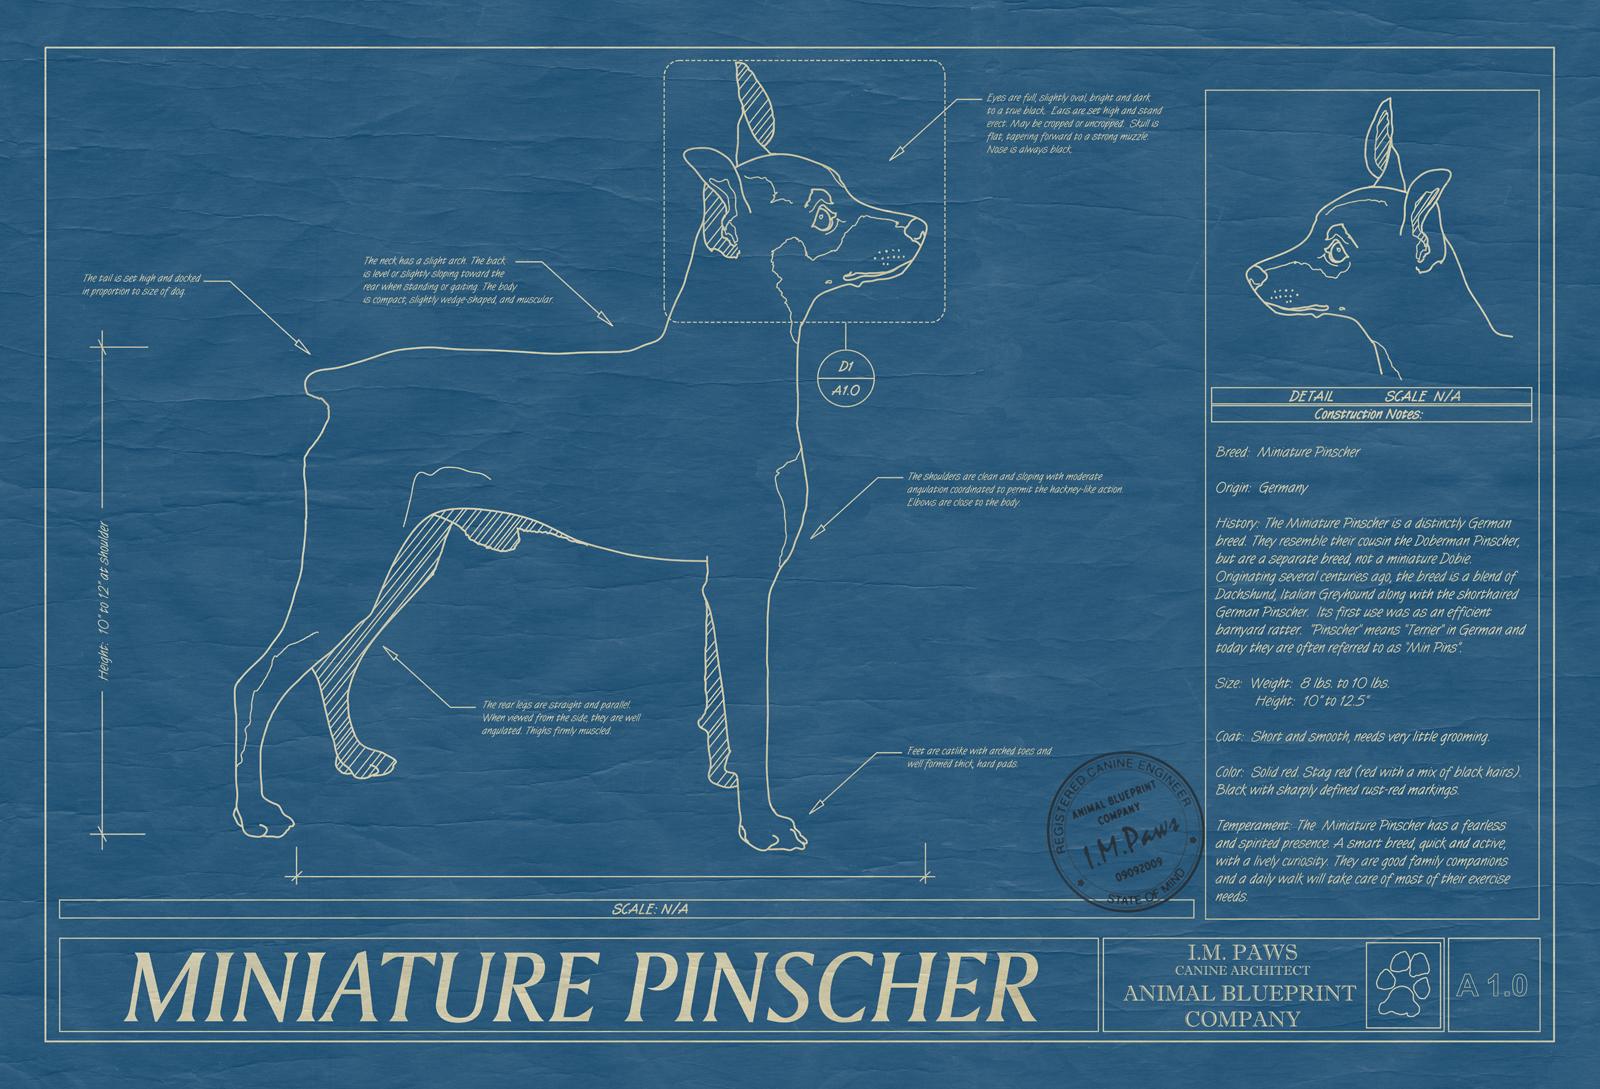 Pinscher miniature animal blueprint company miniature pinscher dog blueprint malvernweather Image collections